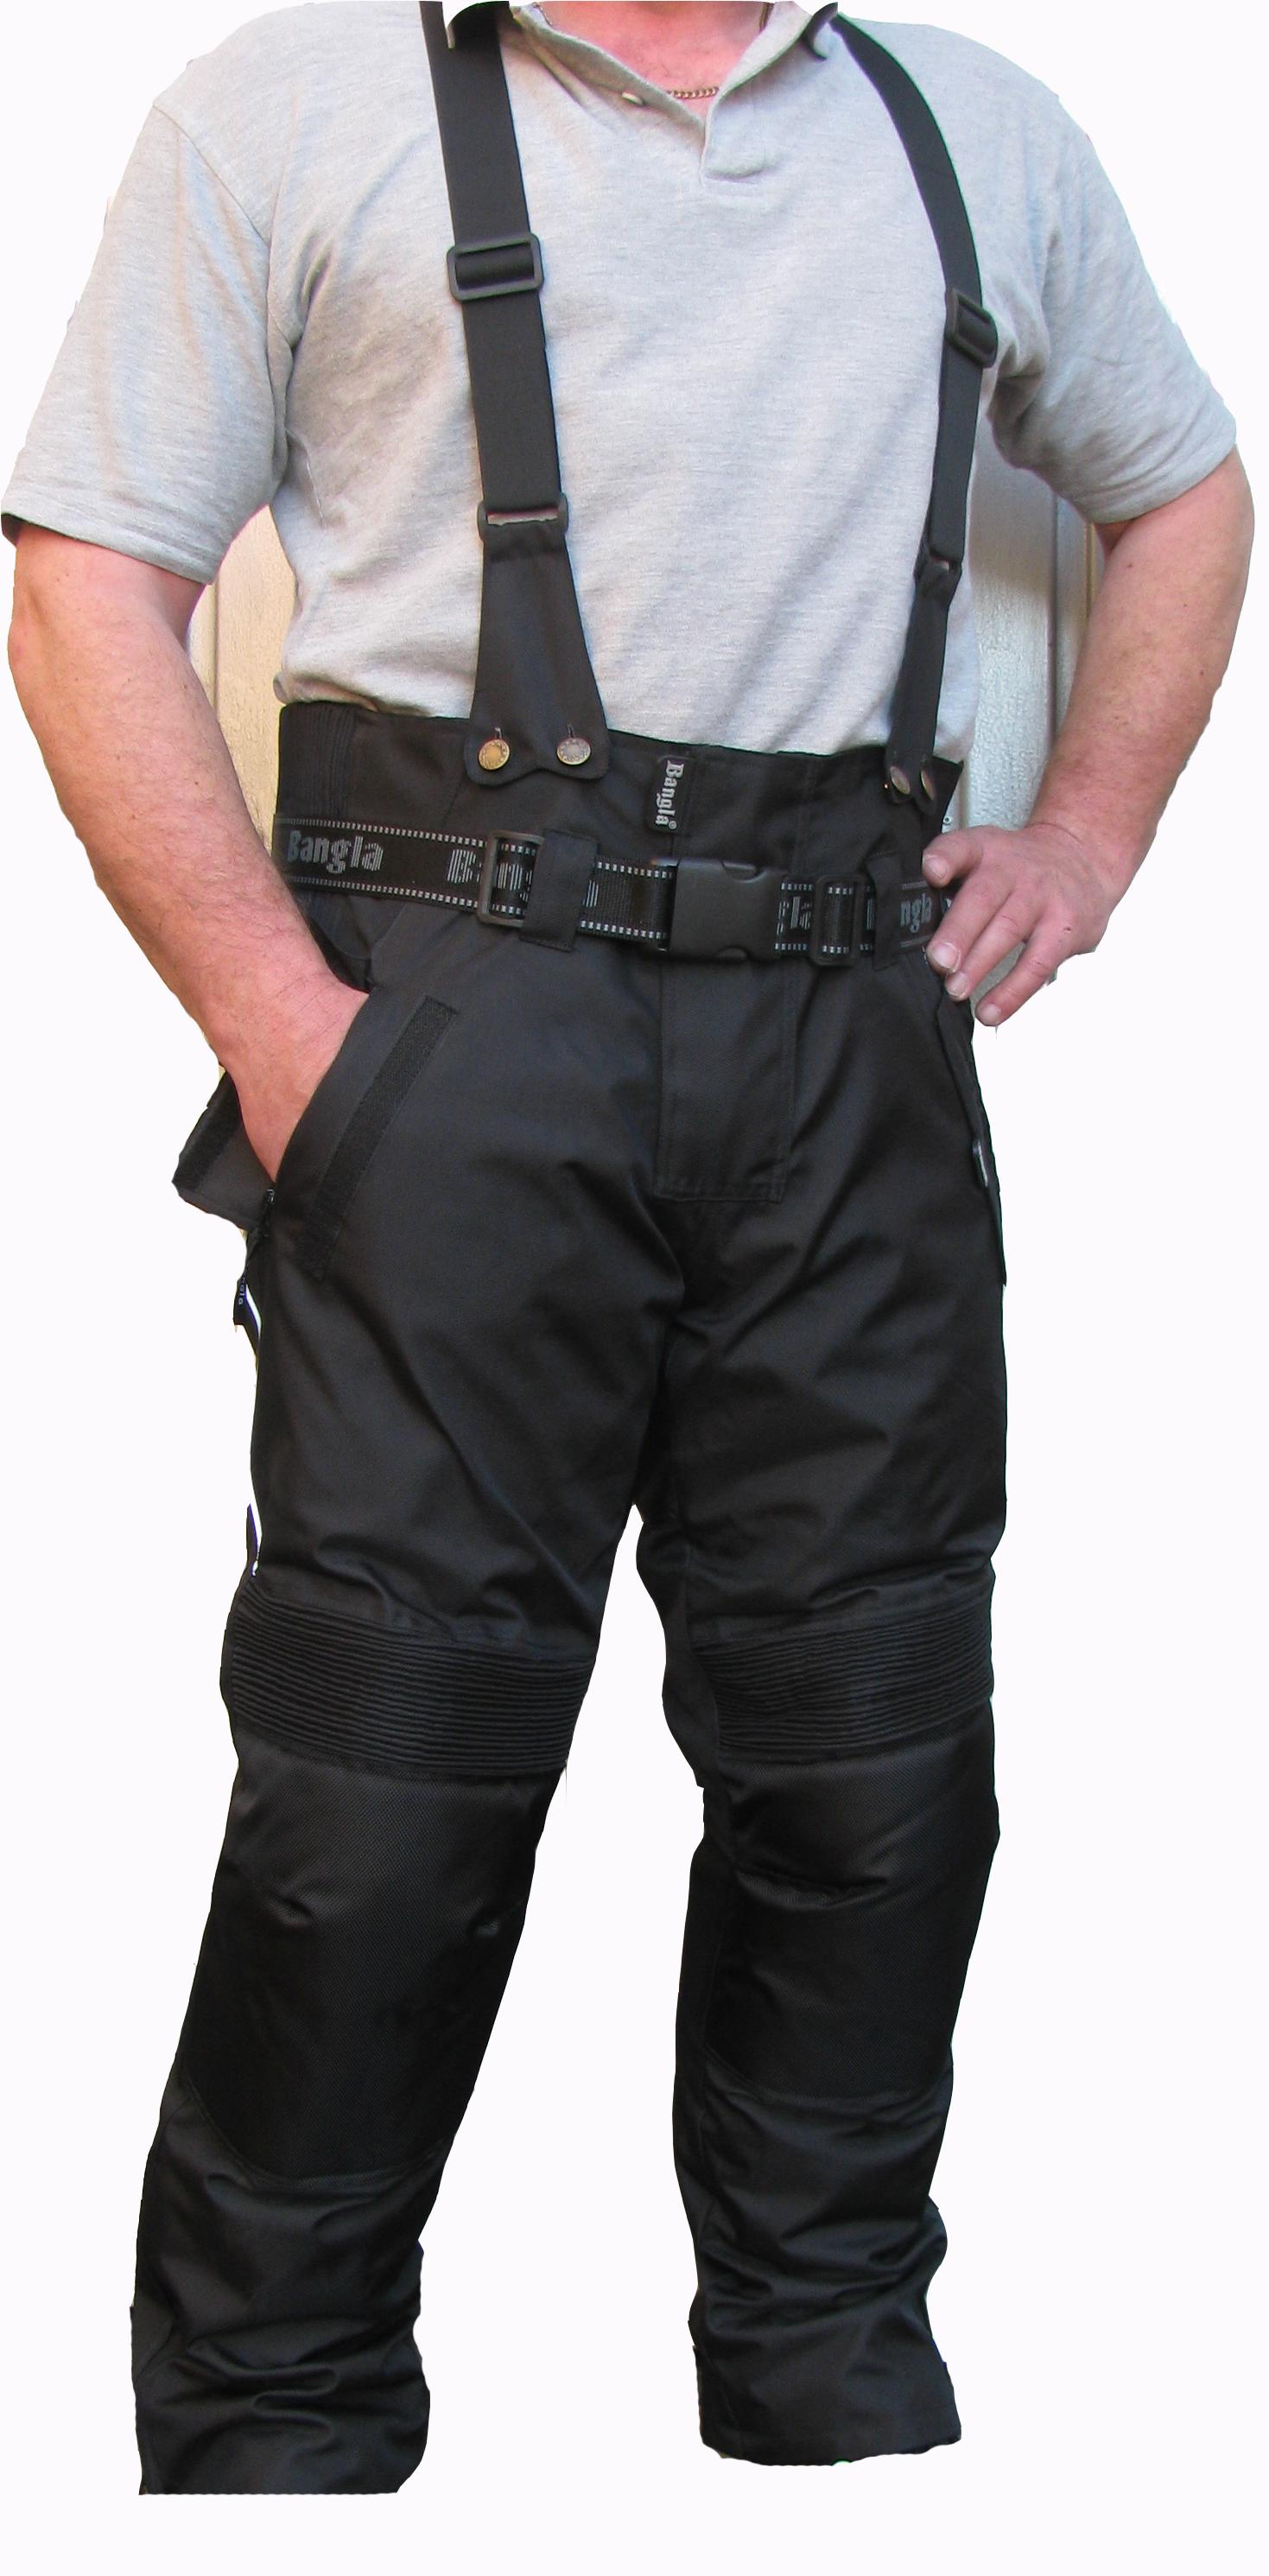 Bangla Motorrad Hose Cordura Schwarz Motorradhose mit Hosenträger Gr S - 5 XL